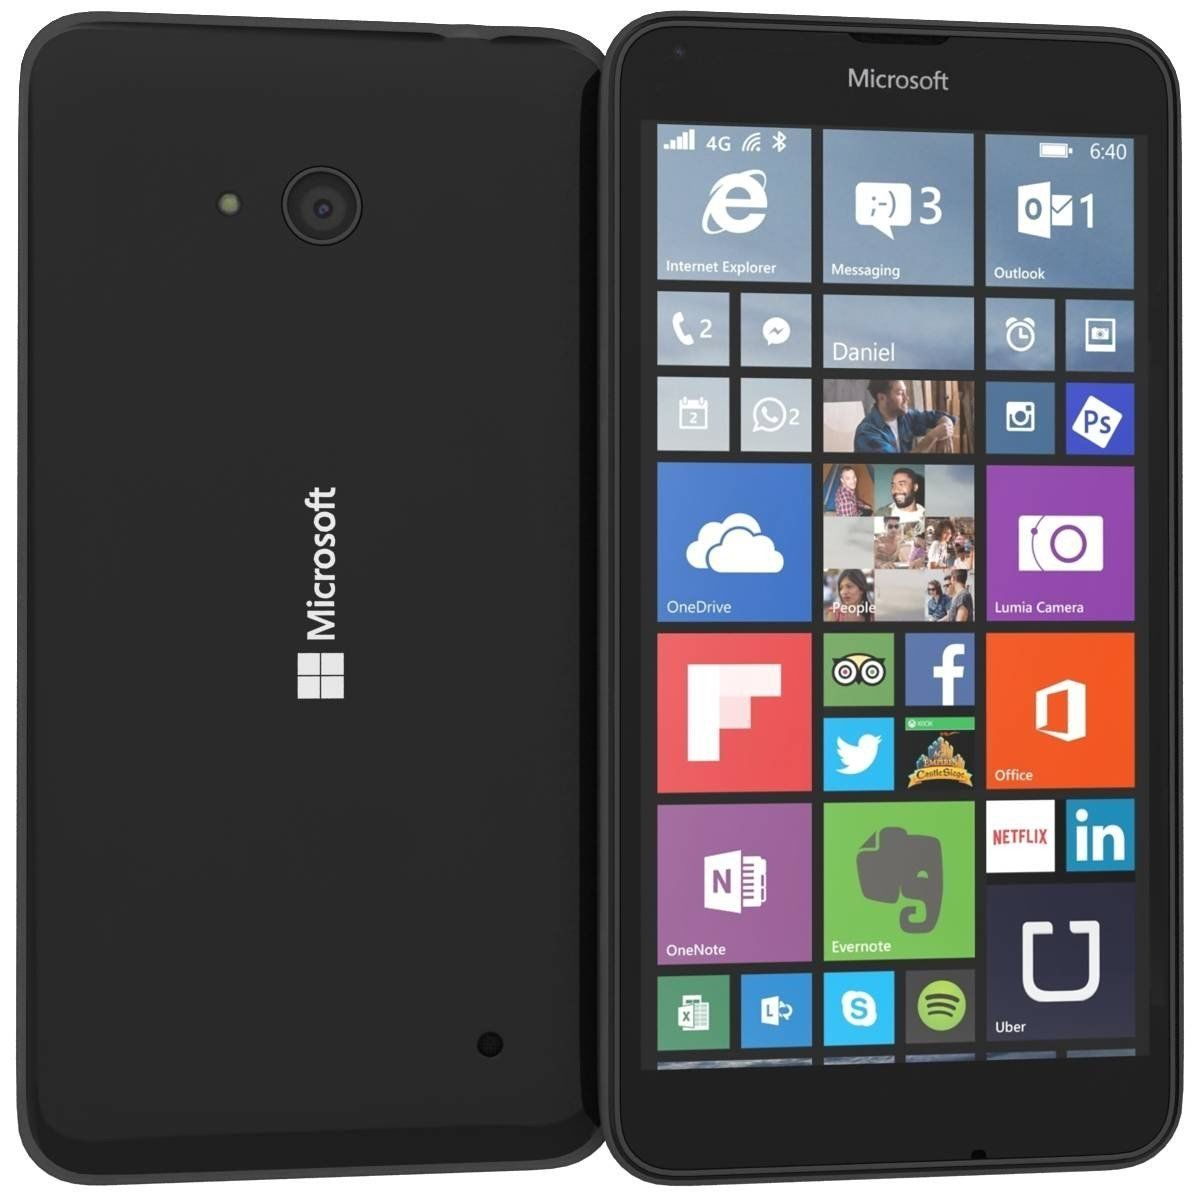 microsoft lumia 640 dual sim 8gb windows smartphone 4g. Black Bedroom Furniture Sets. Home Design Ideas